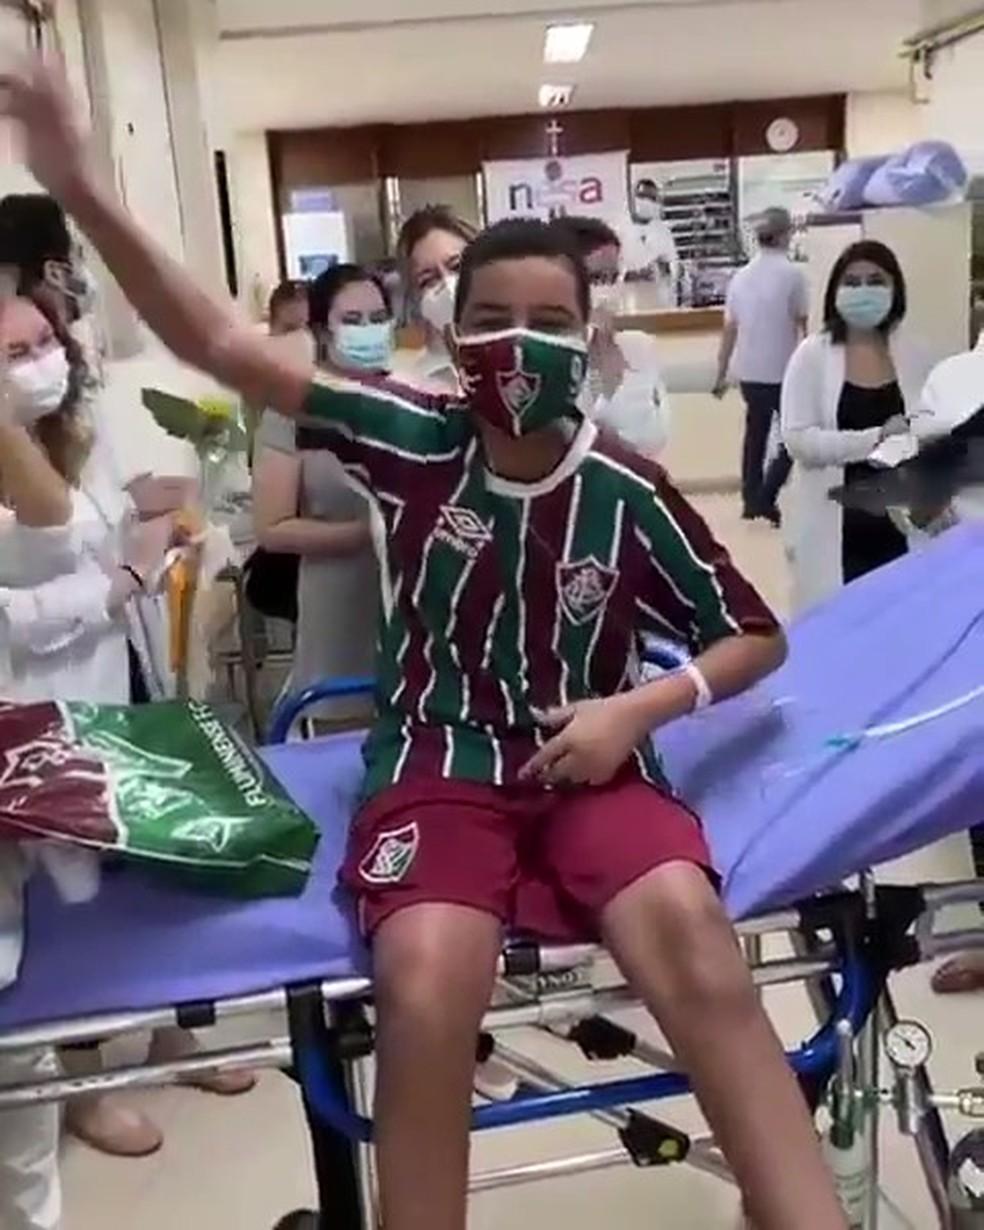 vaquinha voaa menino homenageado fred alta hospital